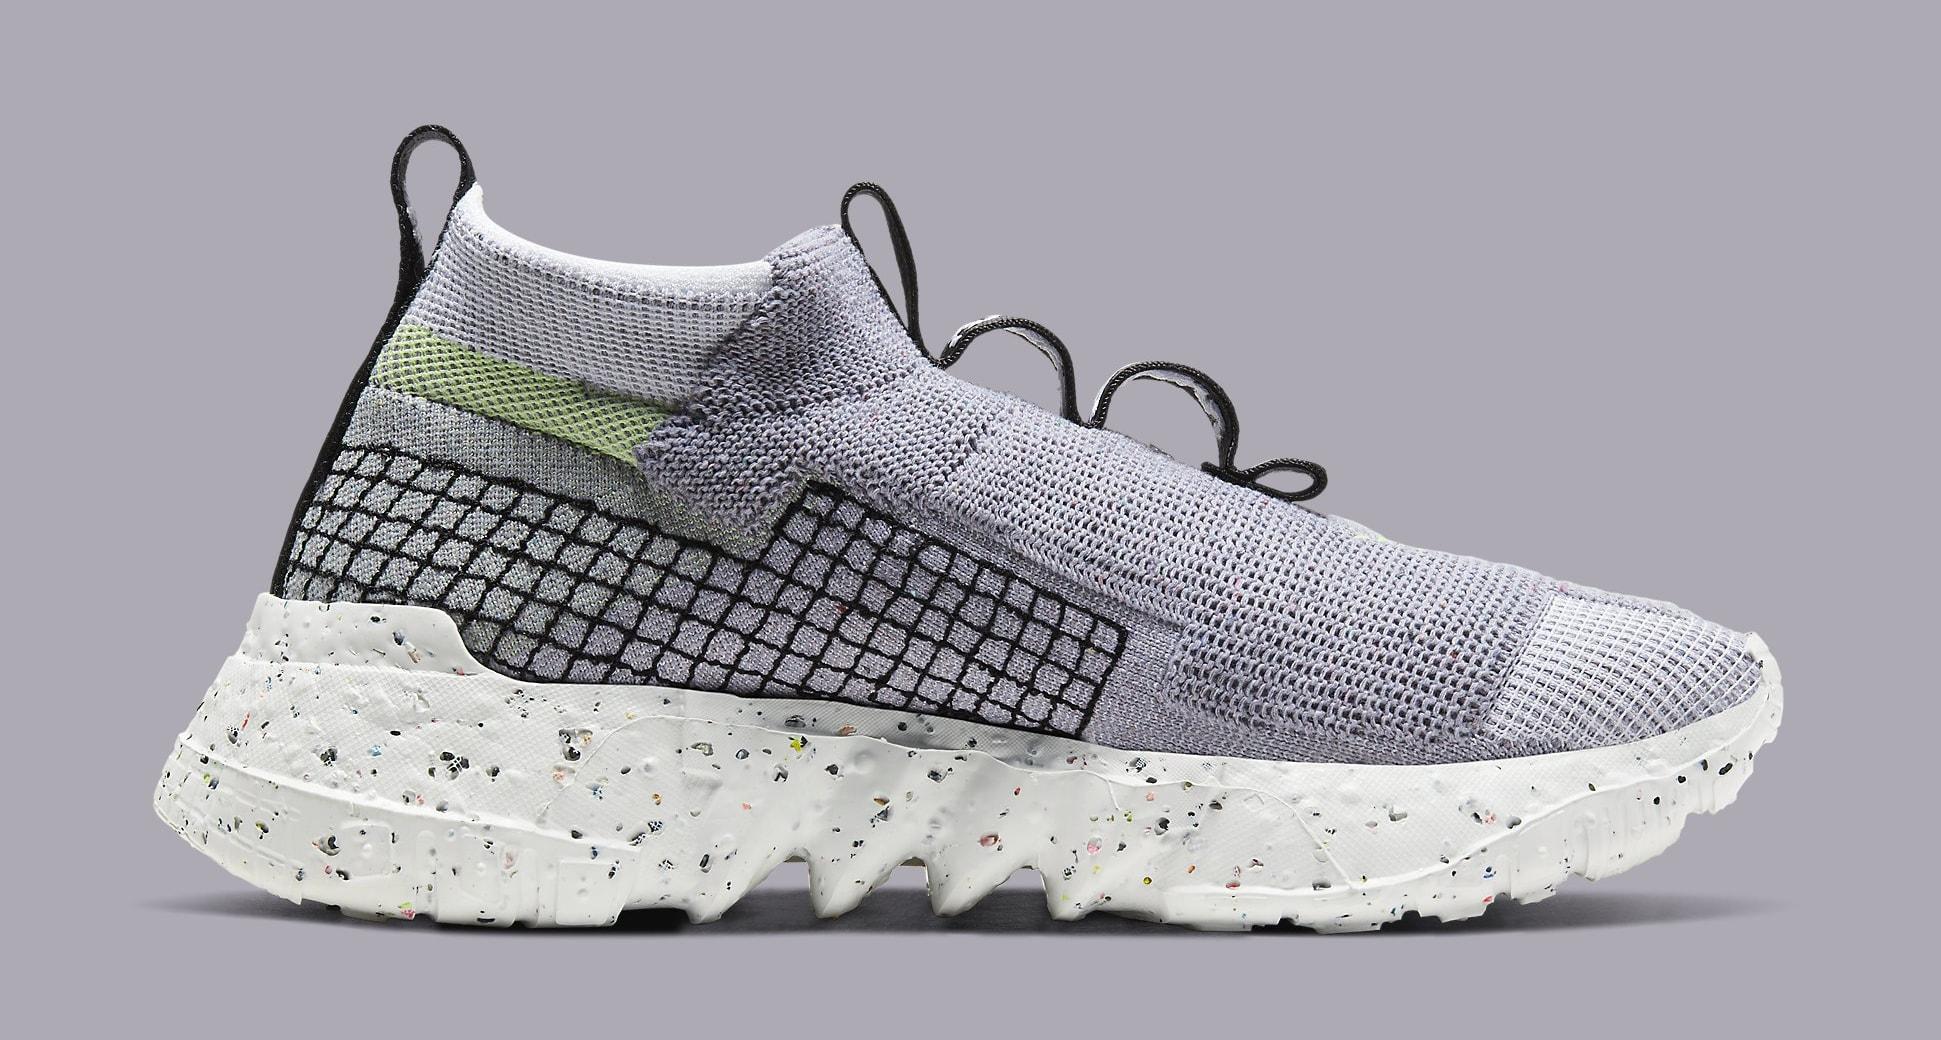 Nike Space Hippie 02 'Grey/Volt' CQ3988-002 Medial